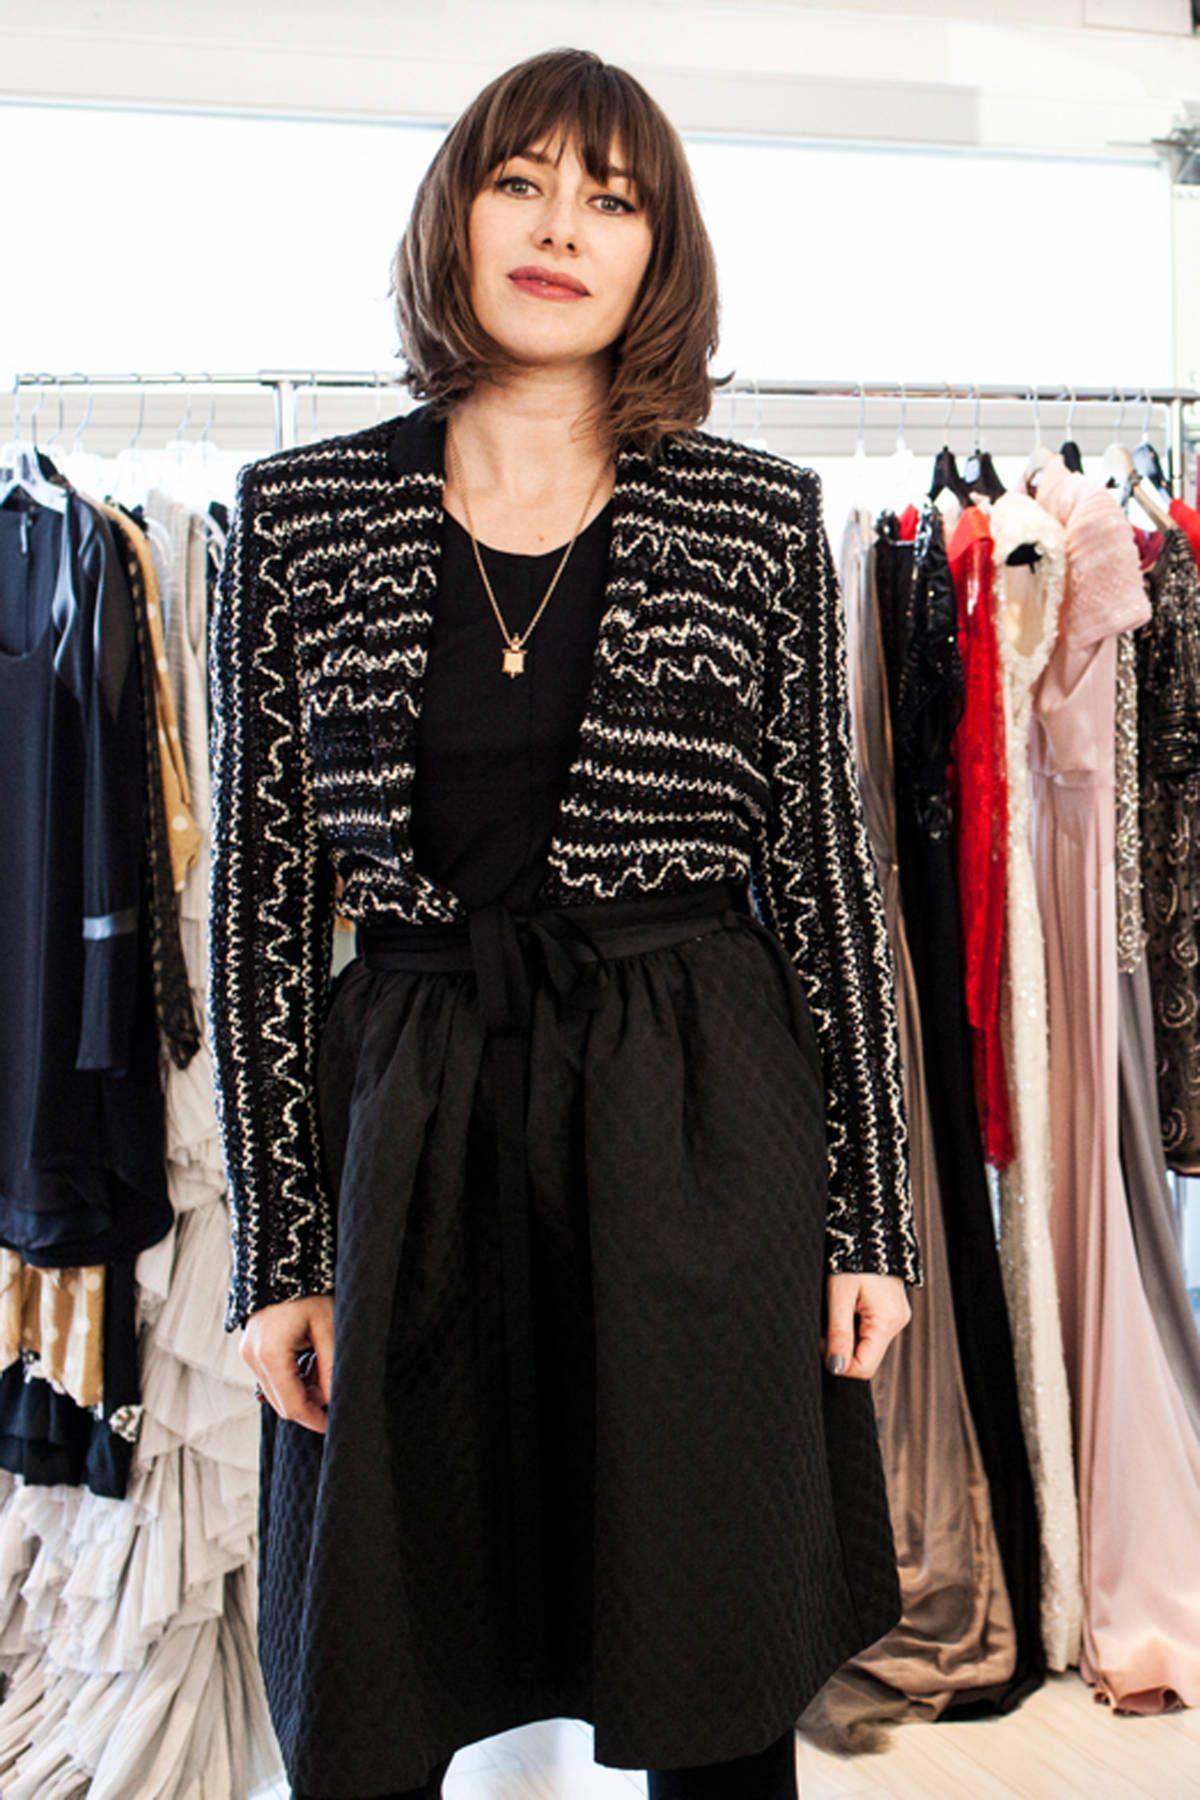 68d02eef6b66f Celebrity Stylist Penny Lovell - Celebrity Style Tips for Eyelet Dresses